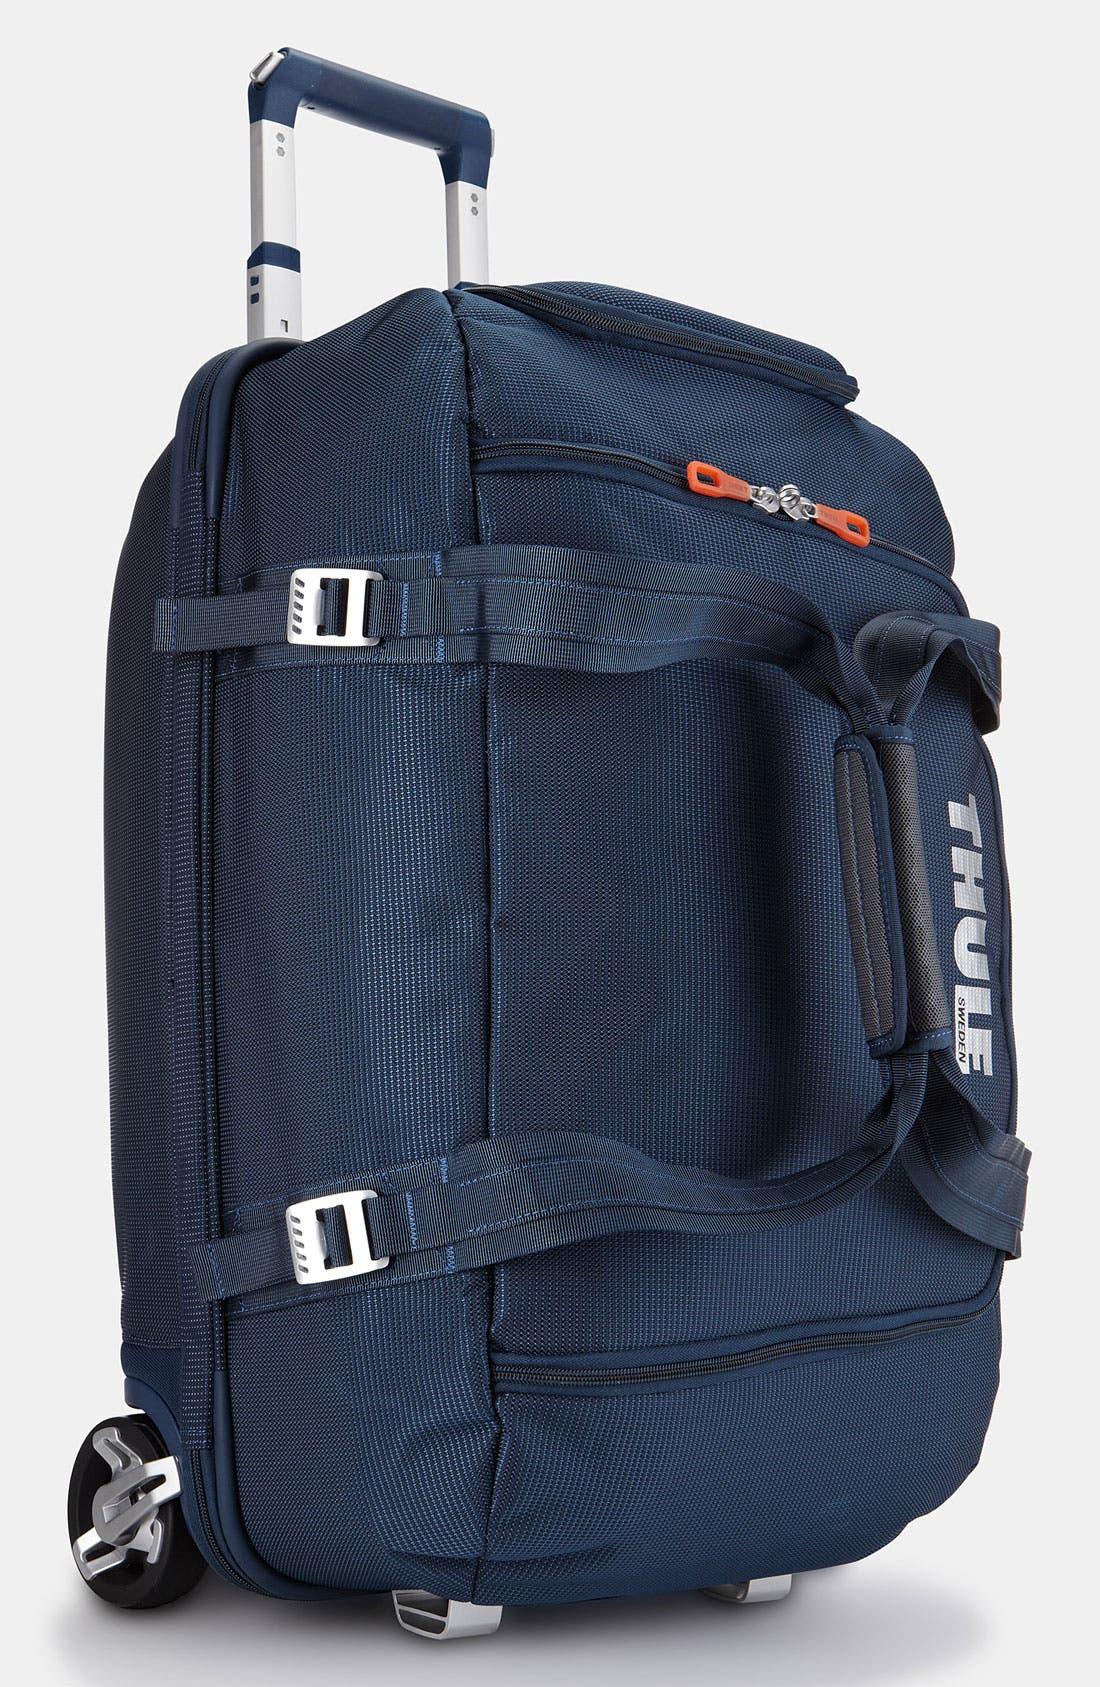 Main Image - Thule 'Crossover' Rolling Duffel Bag (56L)